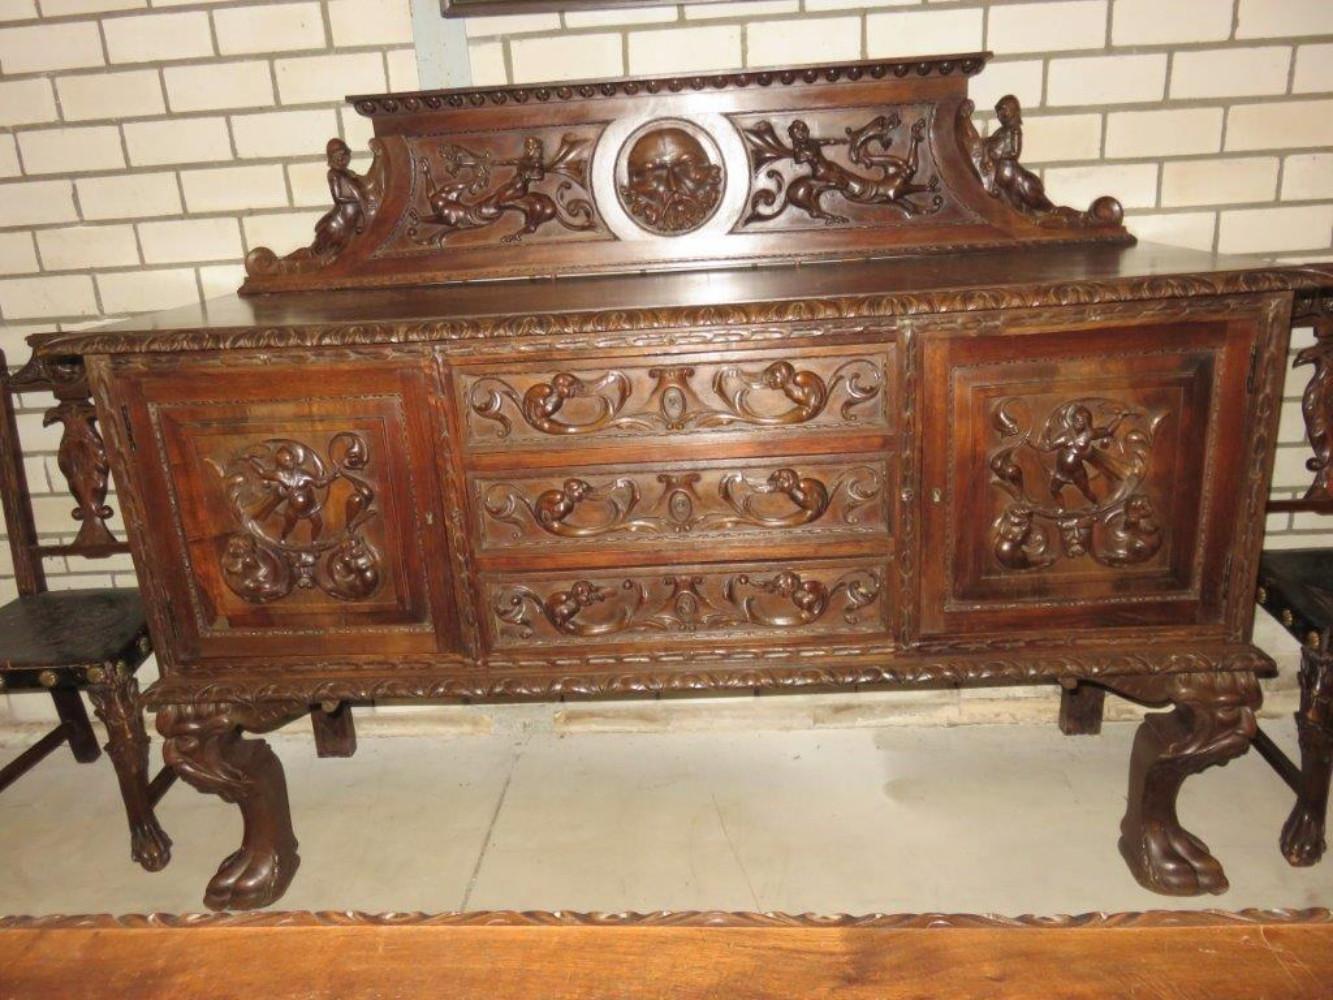 Super Spanish Antique Diningroom Set Dining Rooms Antiques Ad Hommeles Antiques Bv Import Export